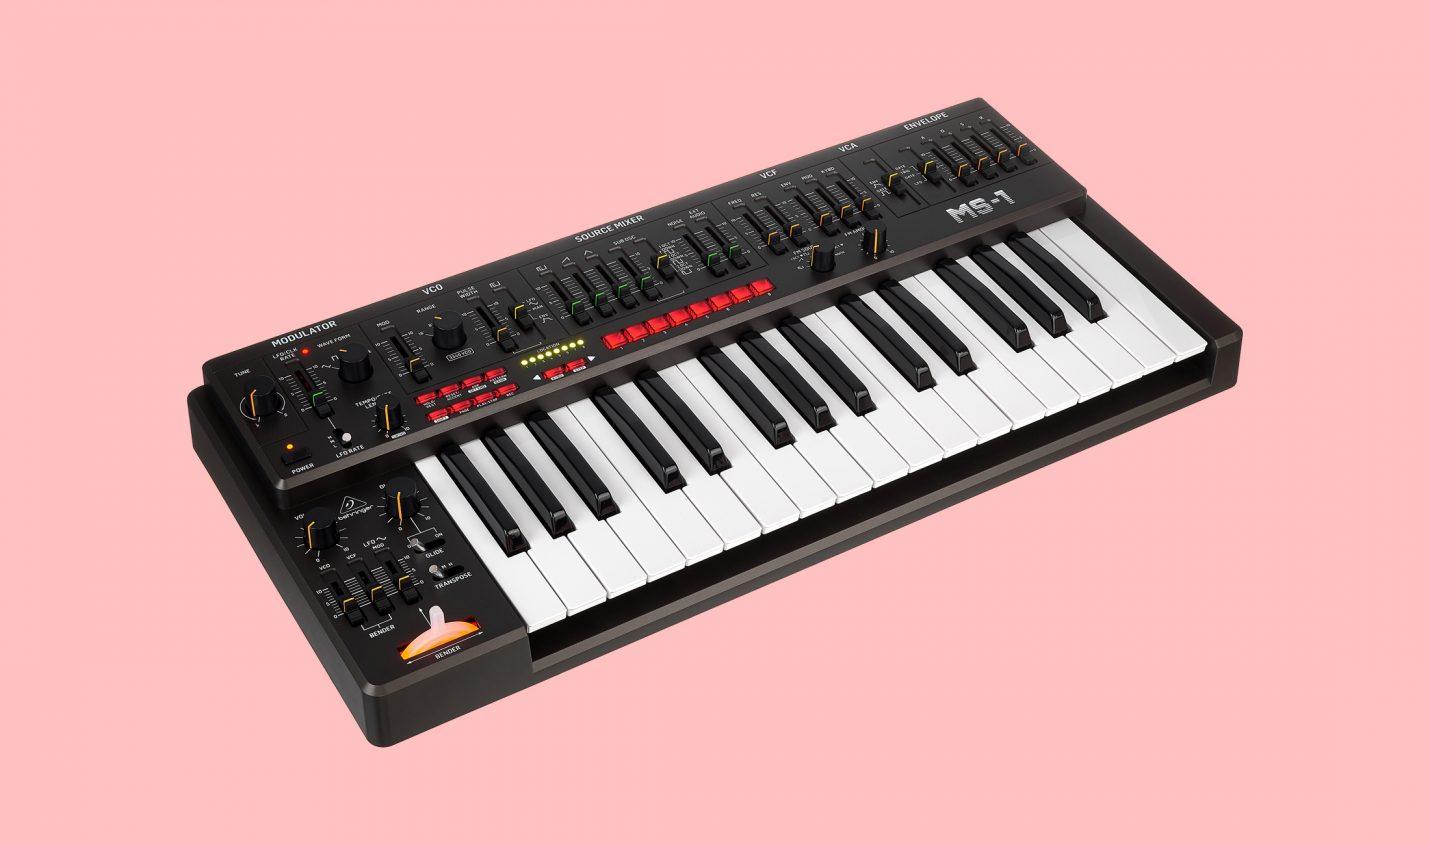 Test: Behringer MS-1 / Analog Synthesizer